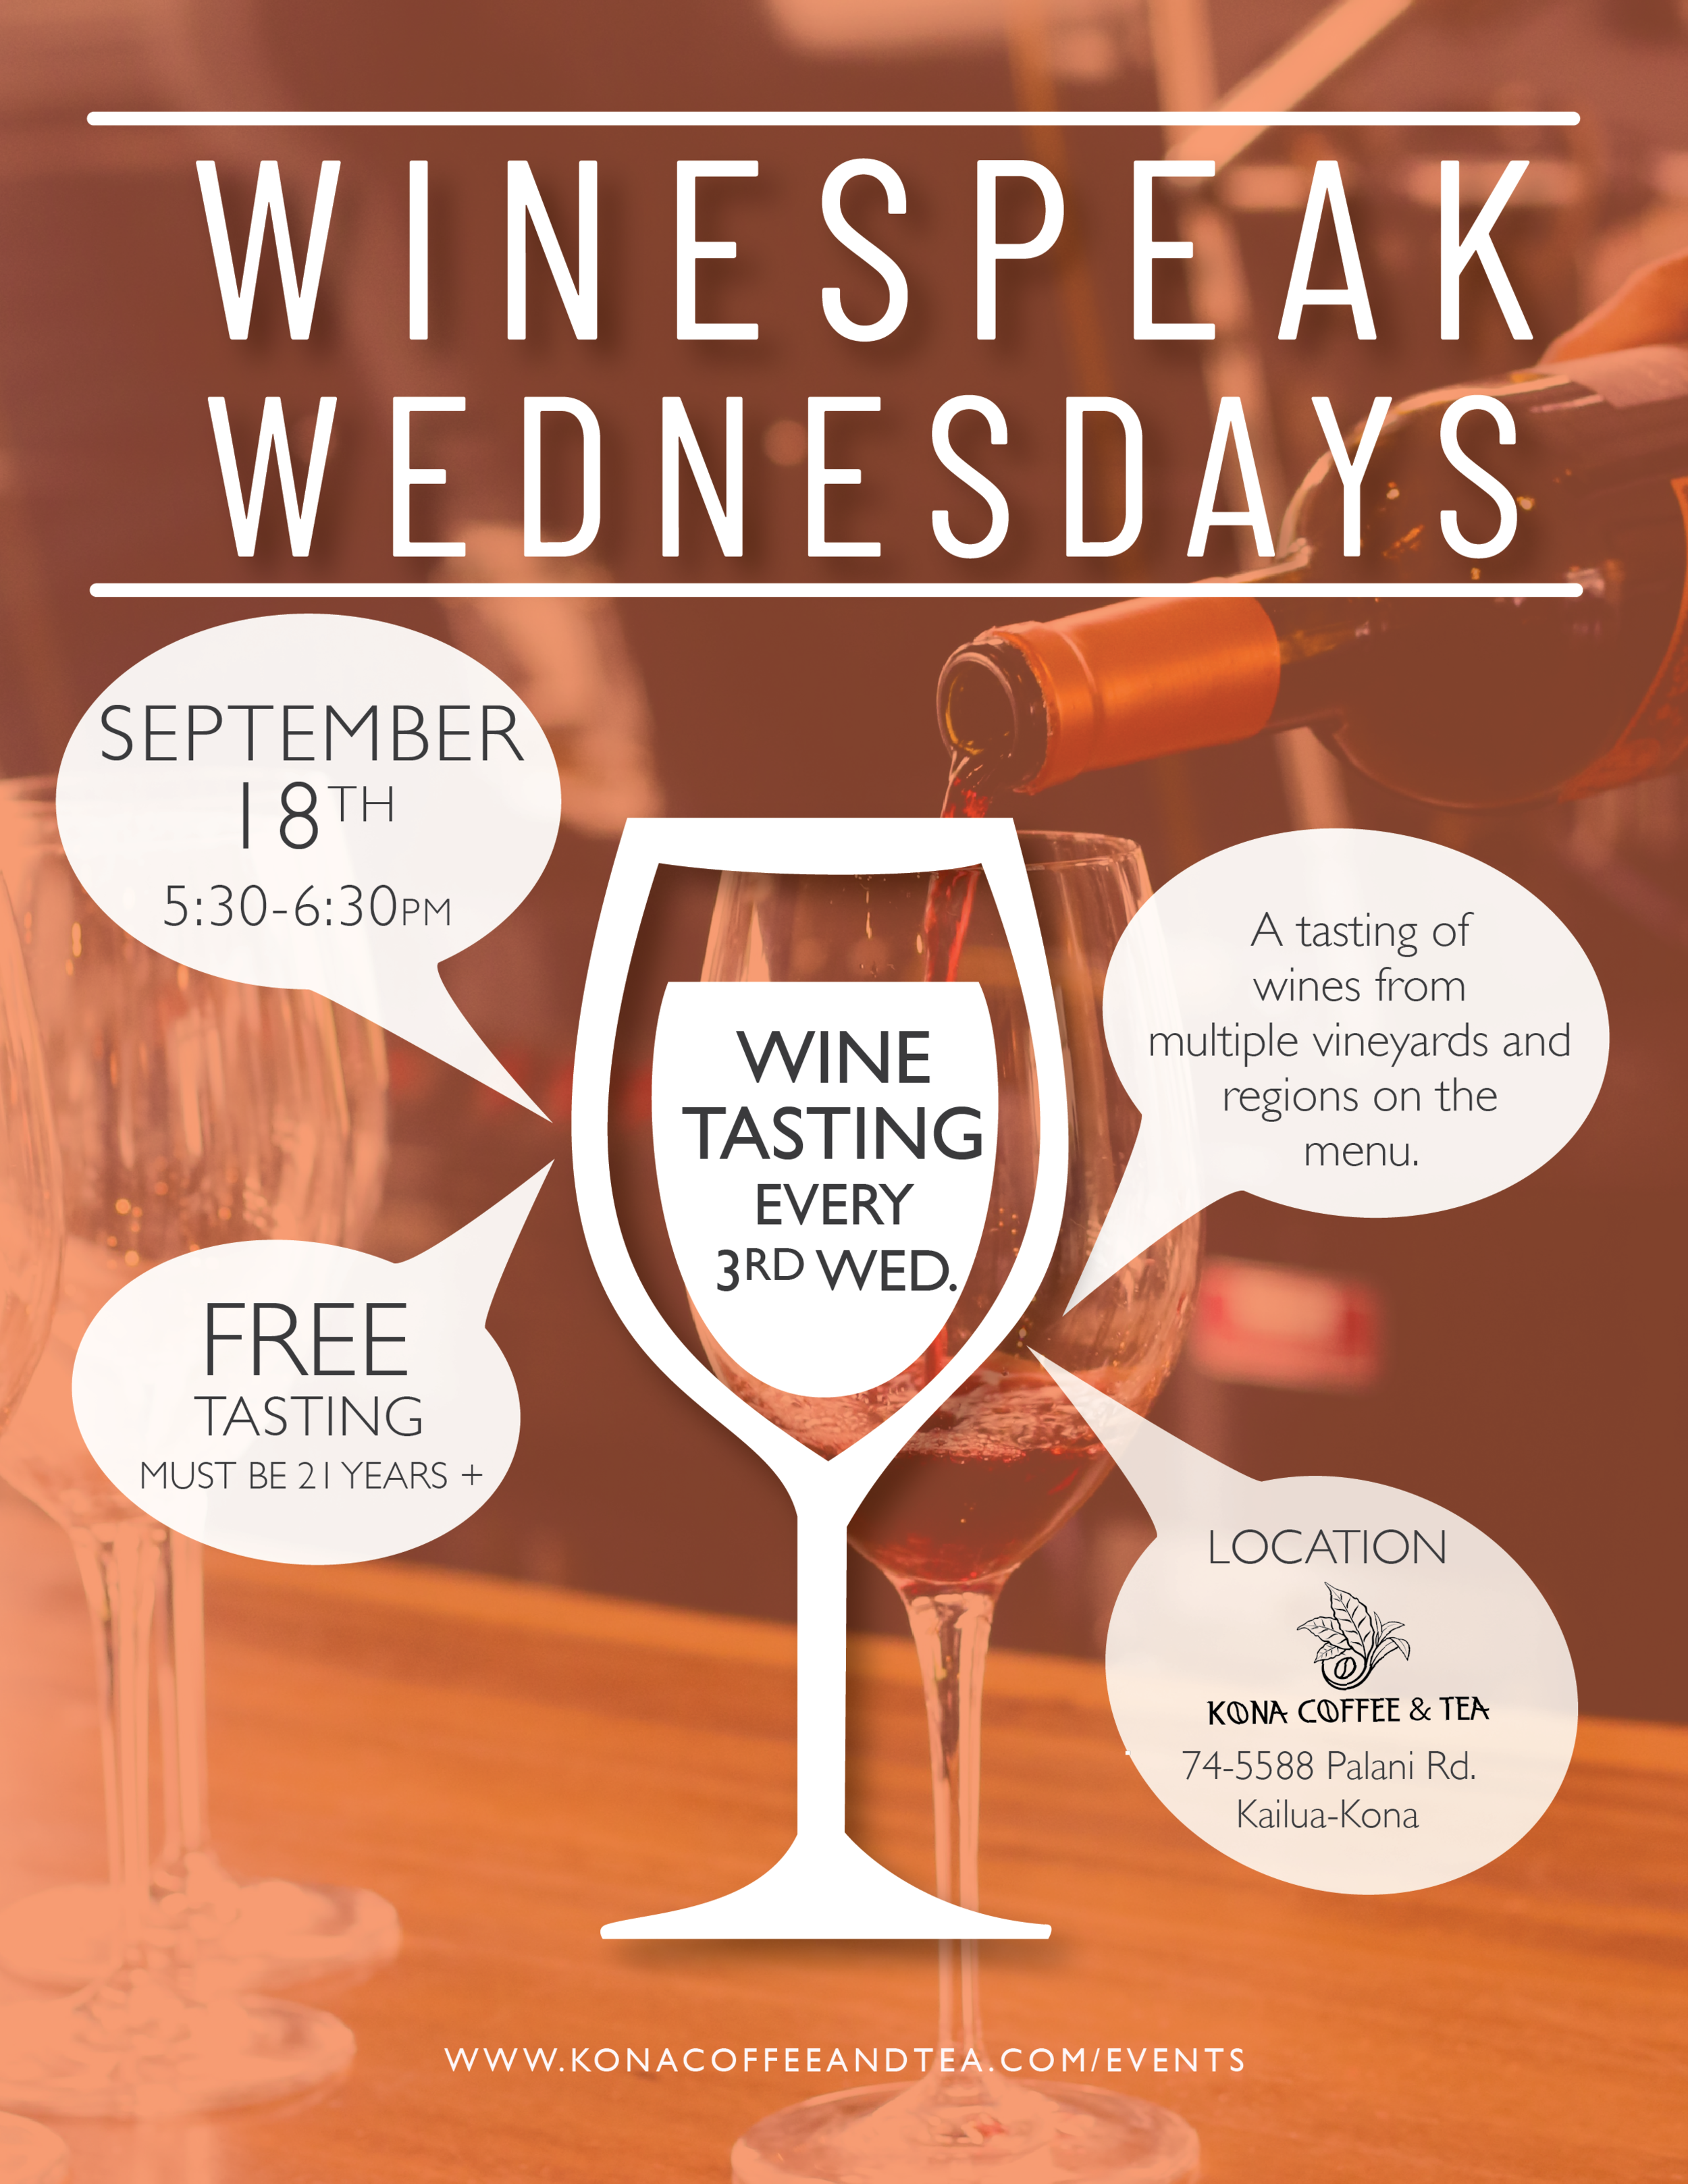 Web WineSpeak Wednesdays_Sept 2019 _KCTC-01 (1).png